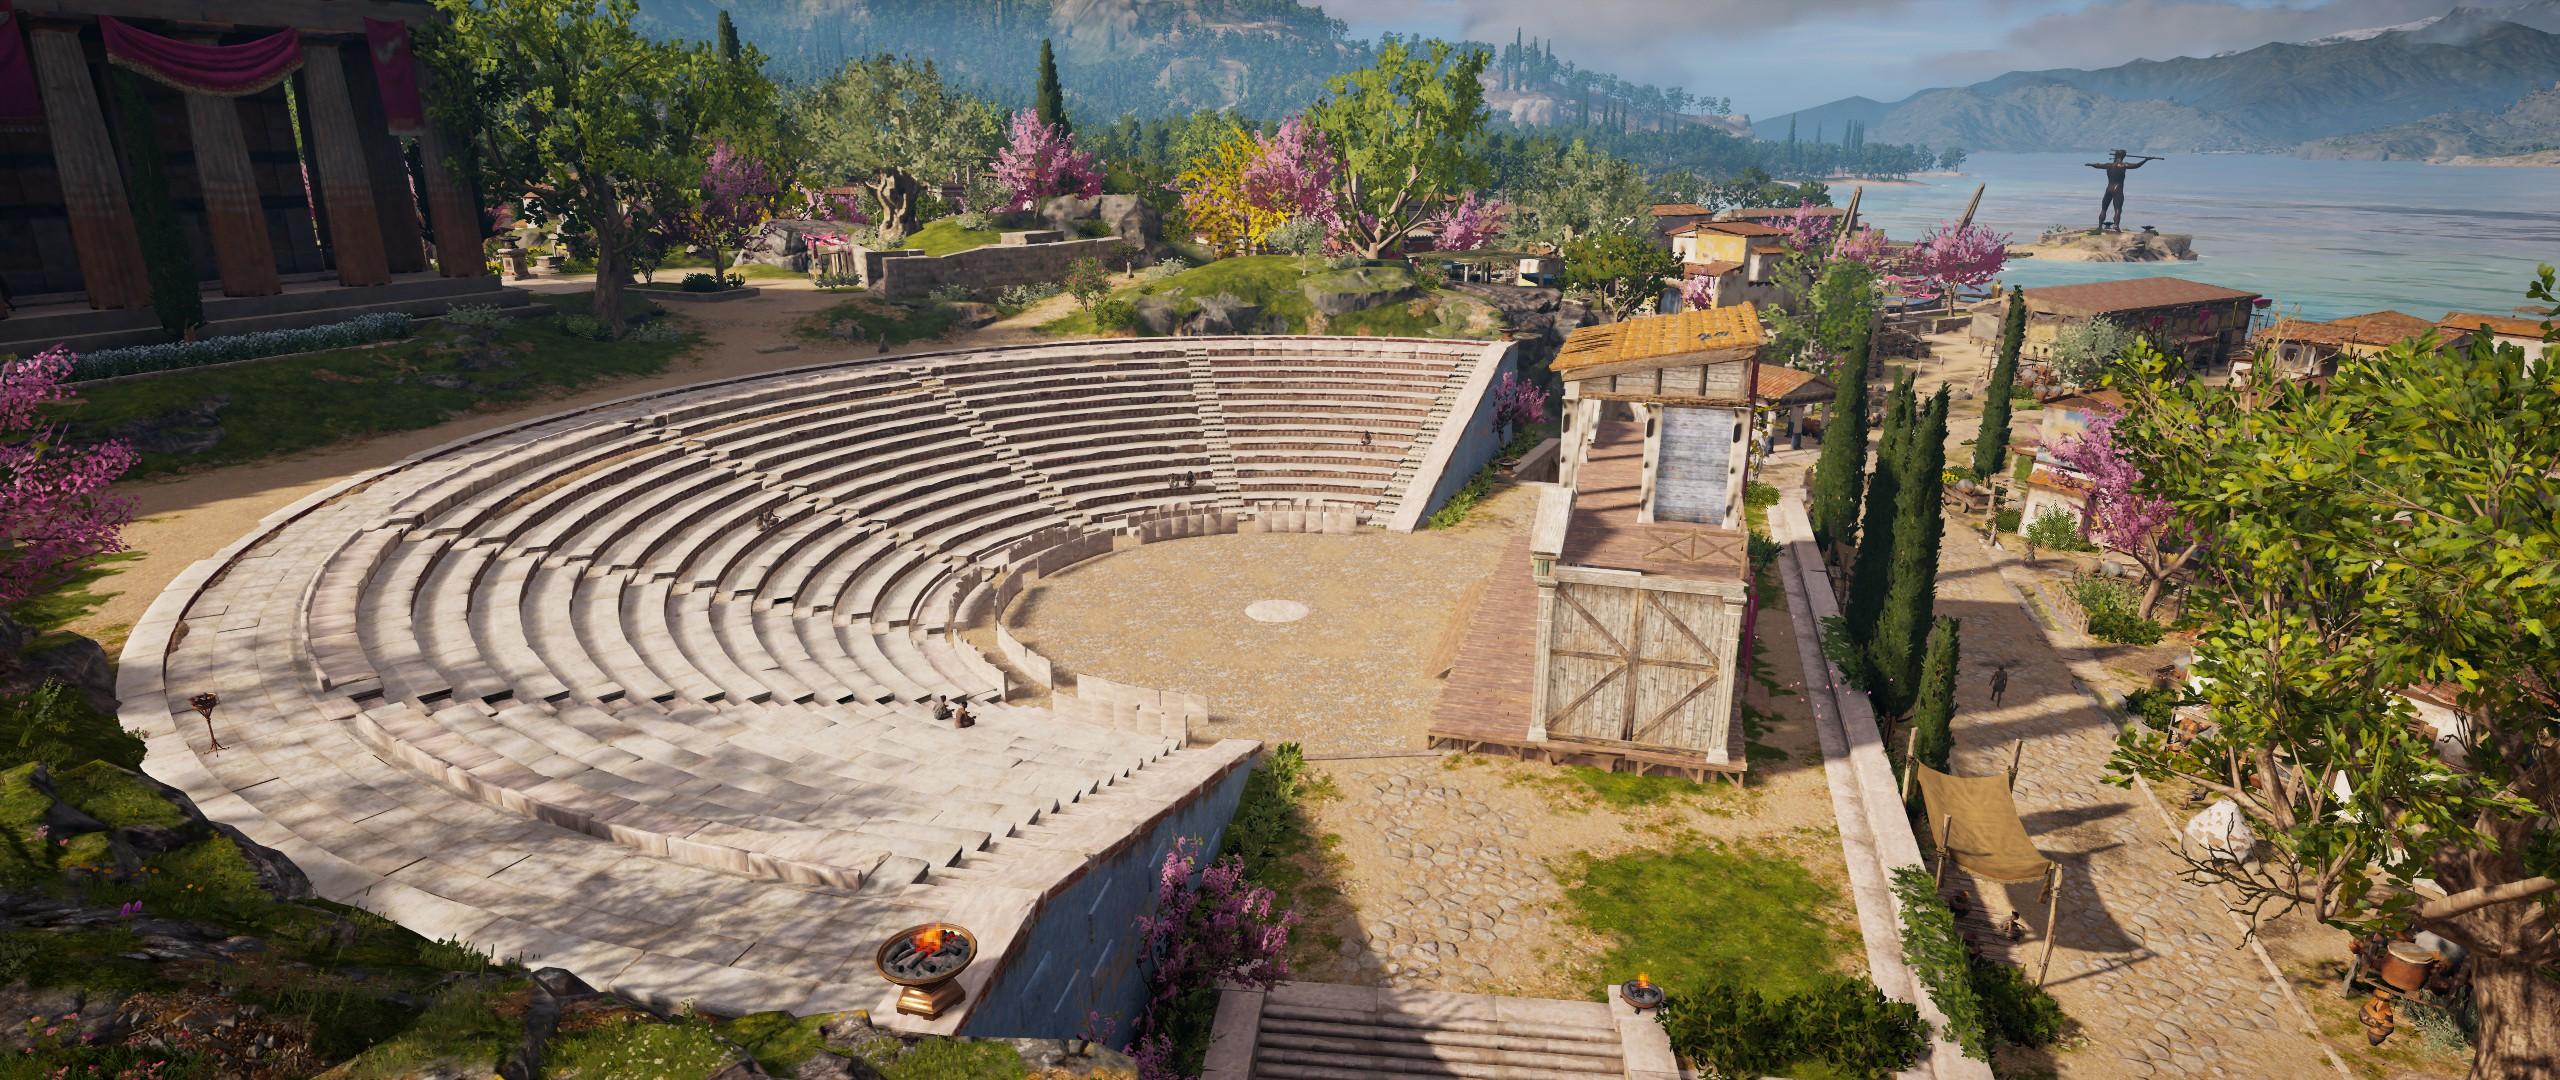 Korinth theater